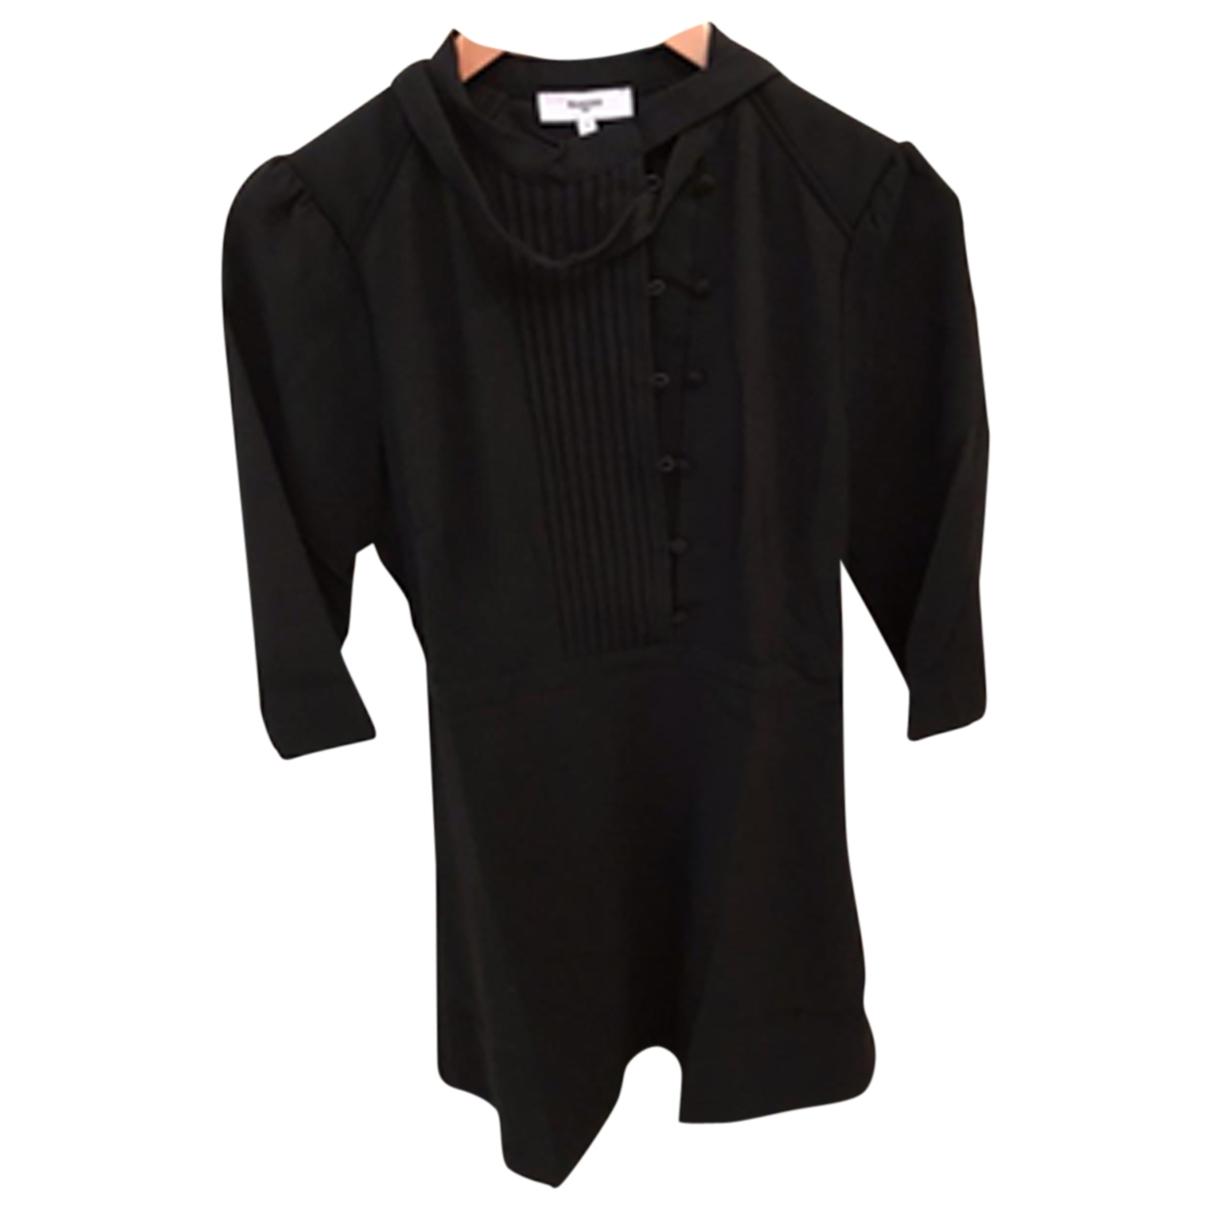 Suncoo \N Black Cotton dress for Women S International